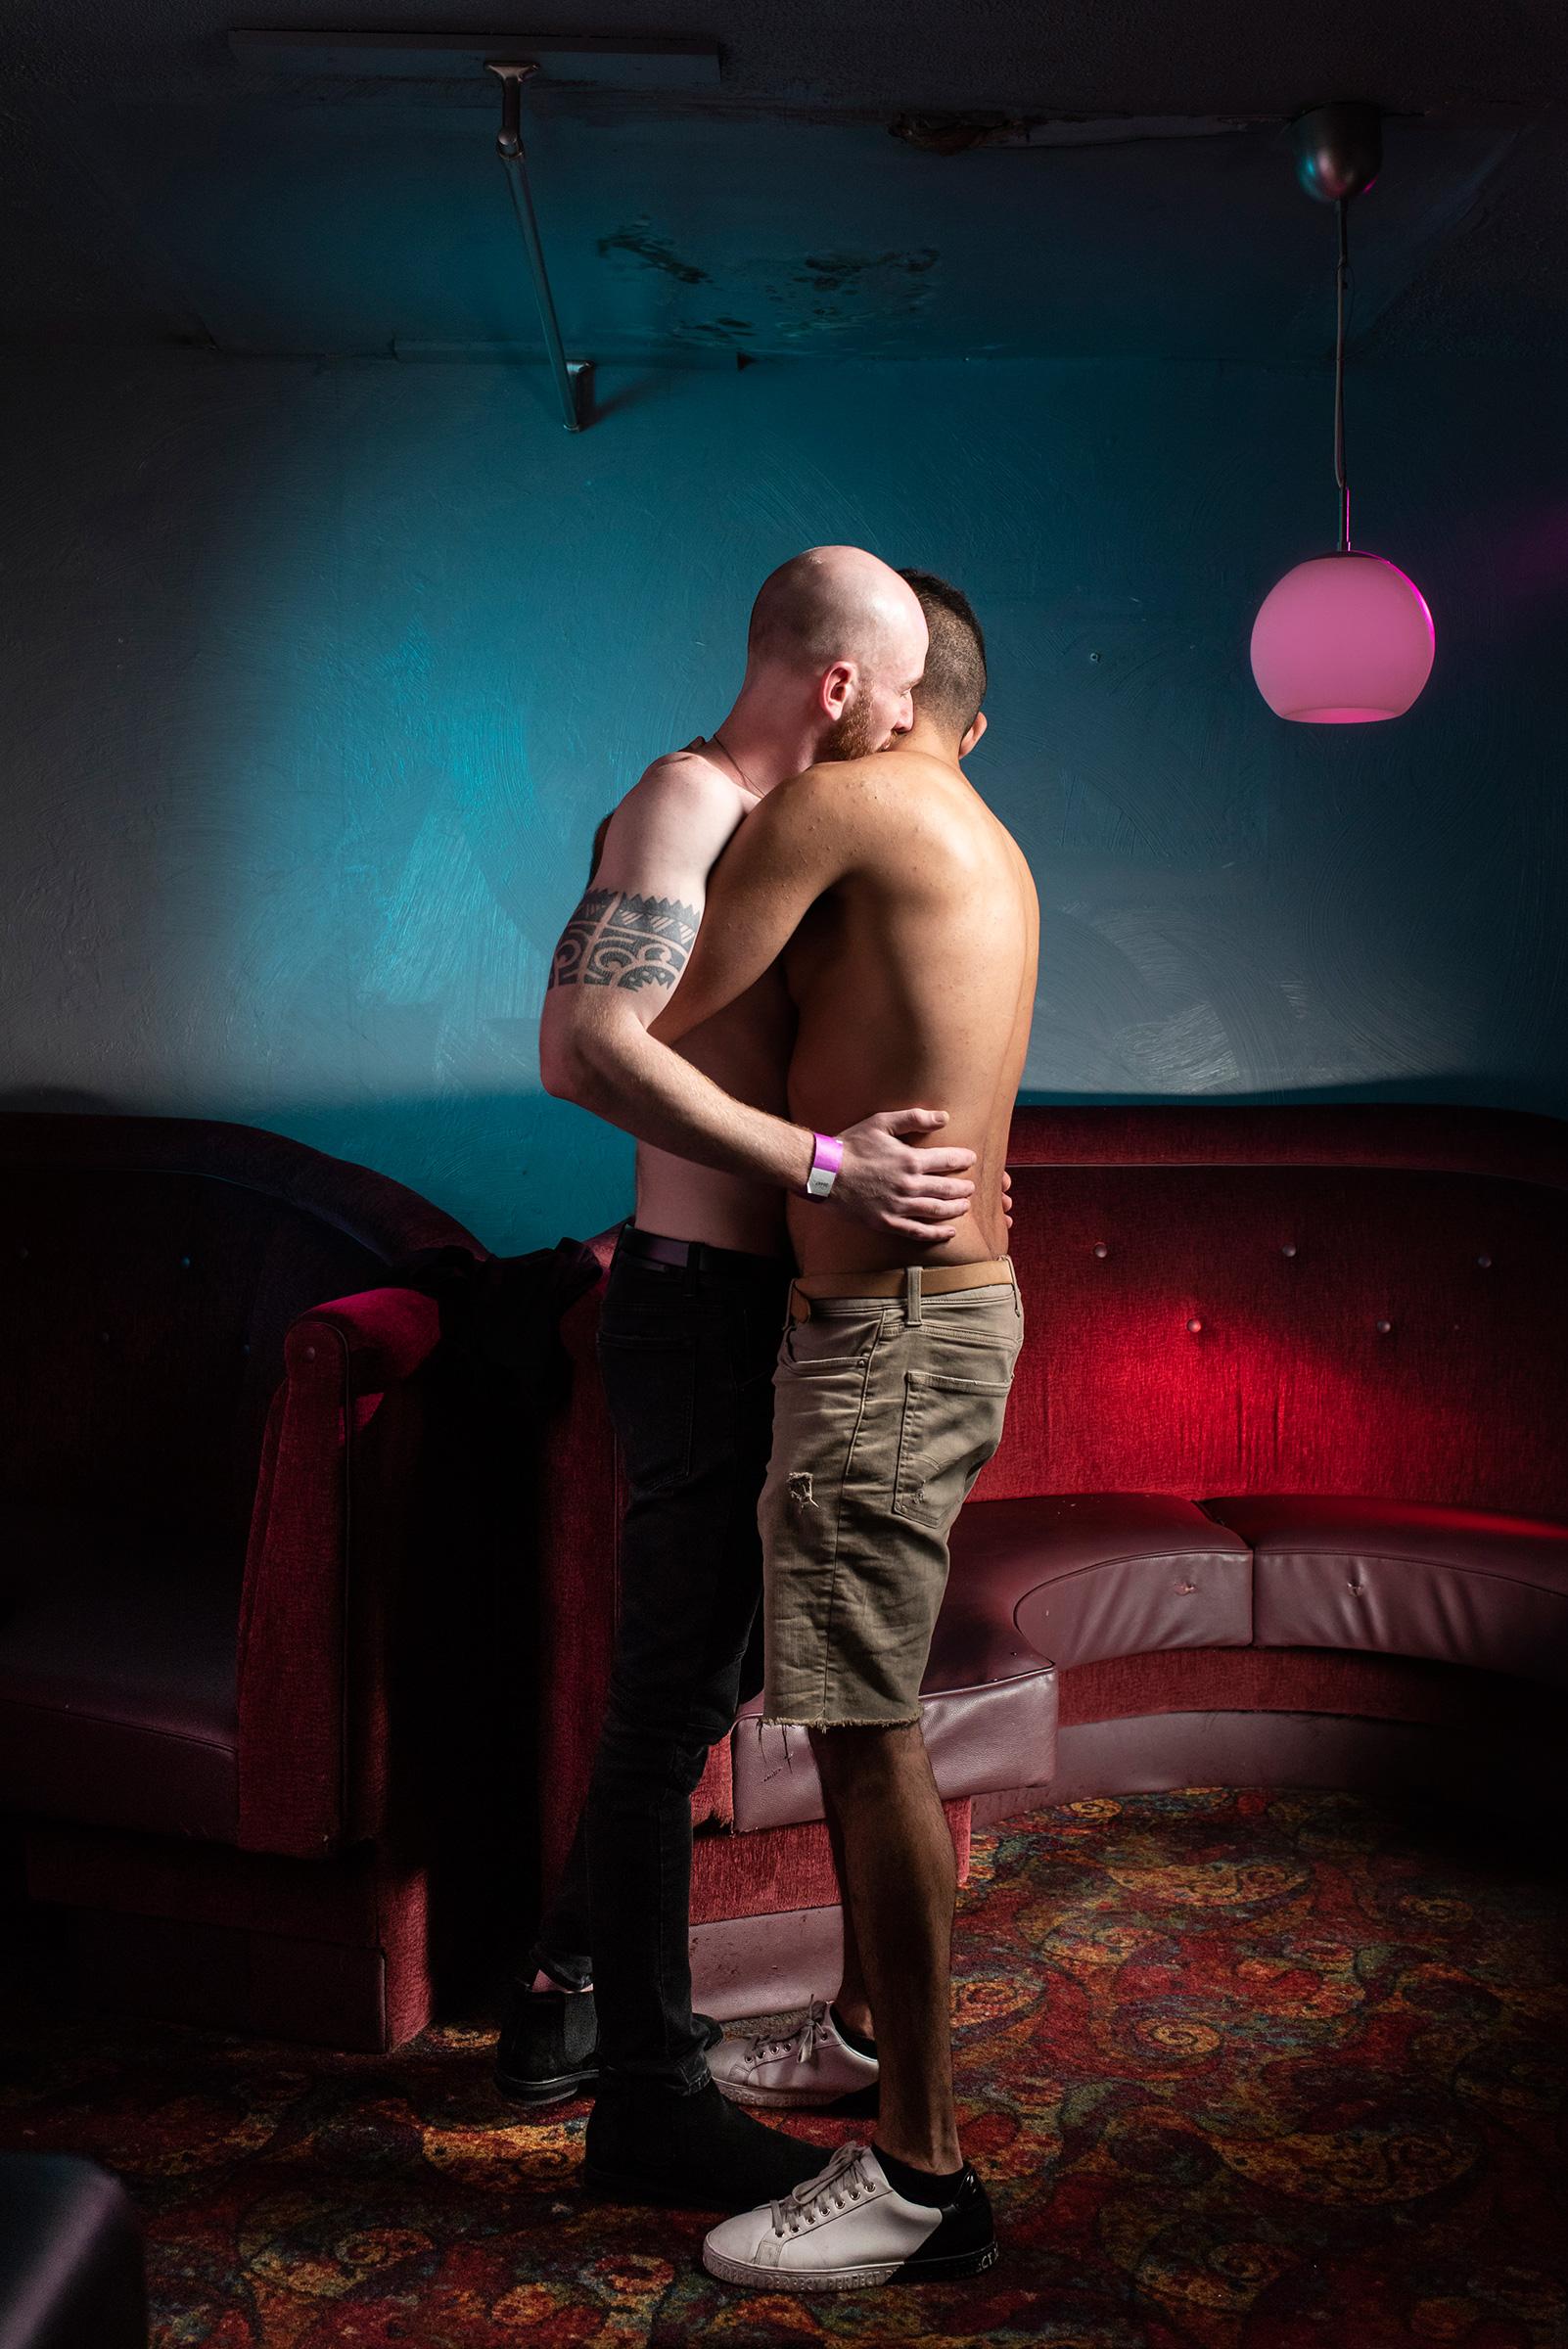 Zach Spaulding and Farzad Alikozai embrace at Stonewall.